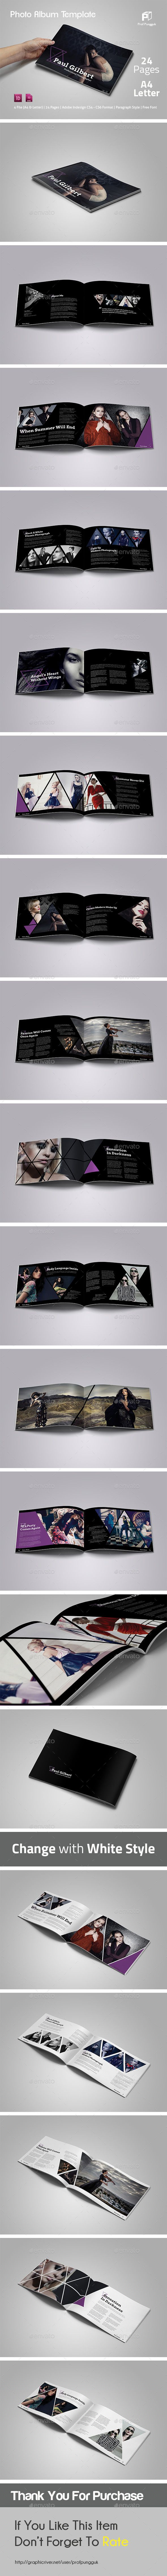 Modern Photo Album Vol.3 - Photo Albums Print Templates